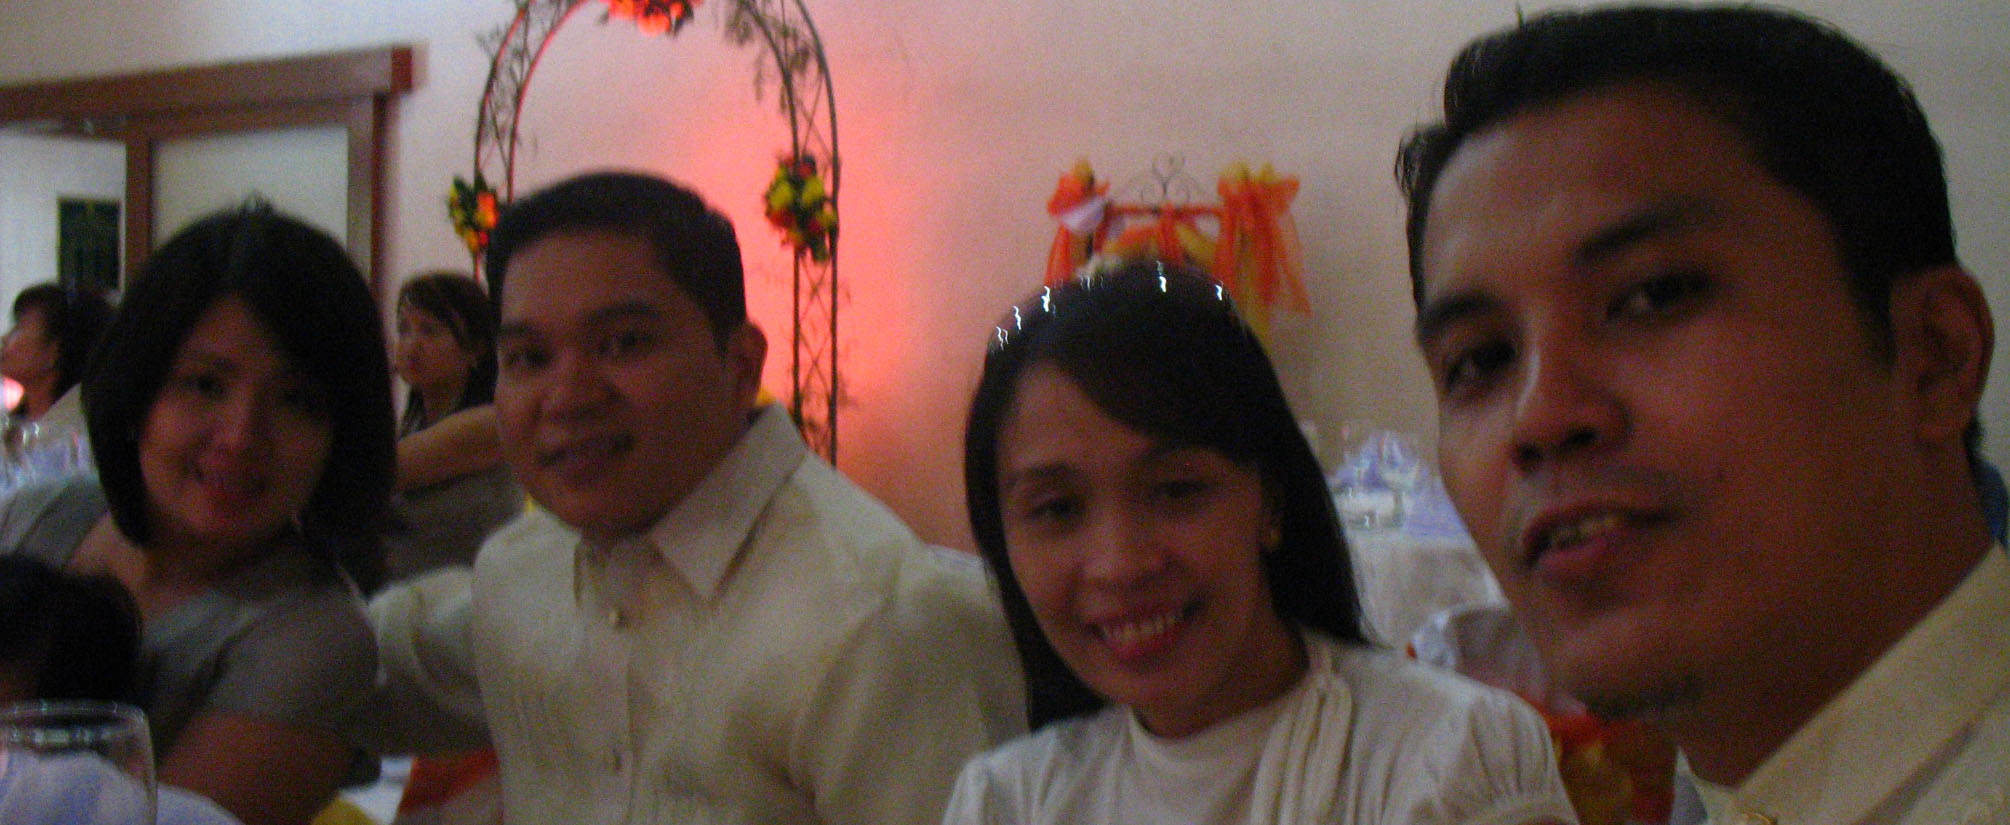 Sheryl, Don Don, Jennie and me at Mandy and Bing's wedding